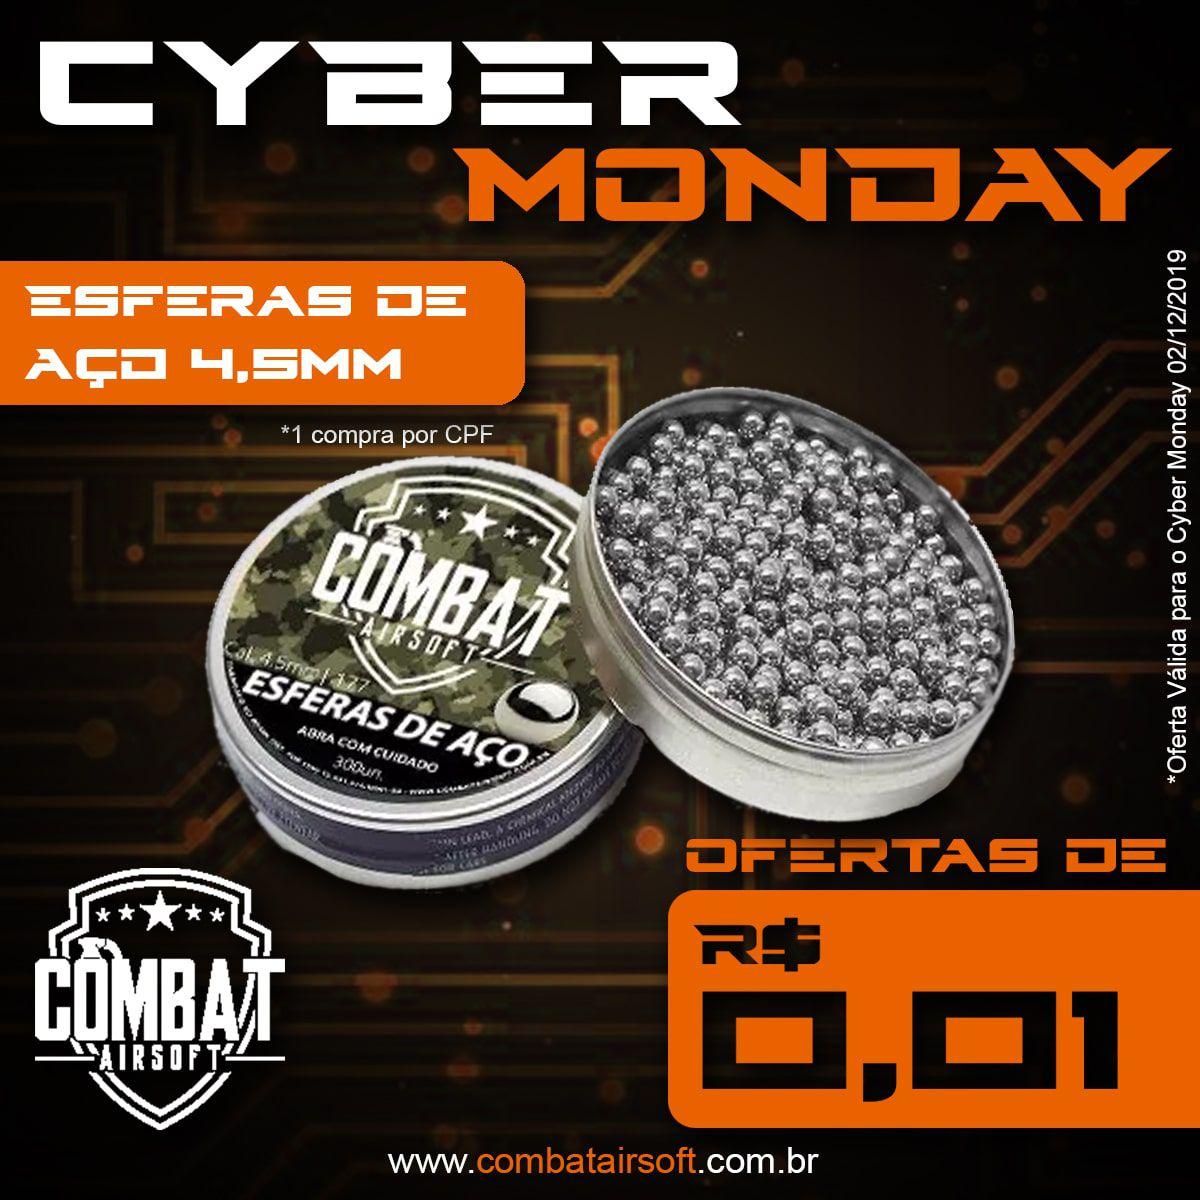 Esferas de Aço Combat airsoft 4,5